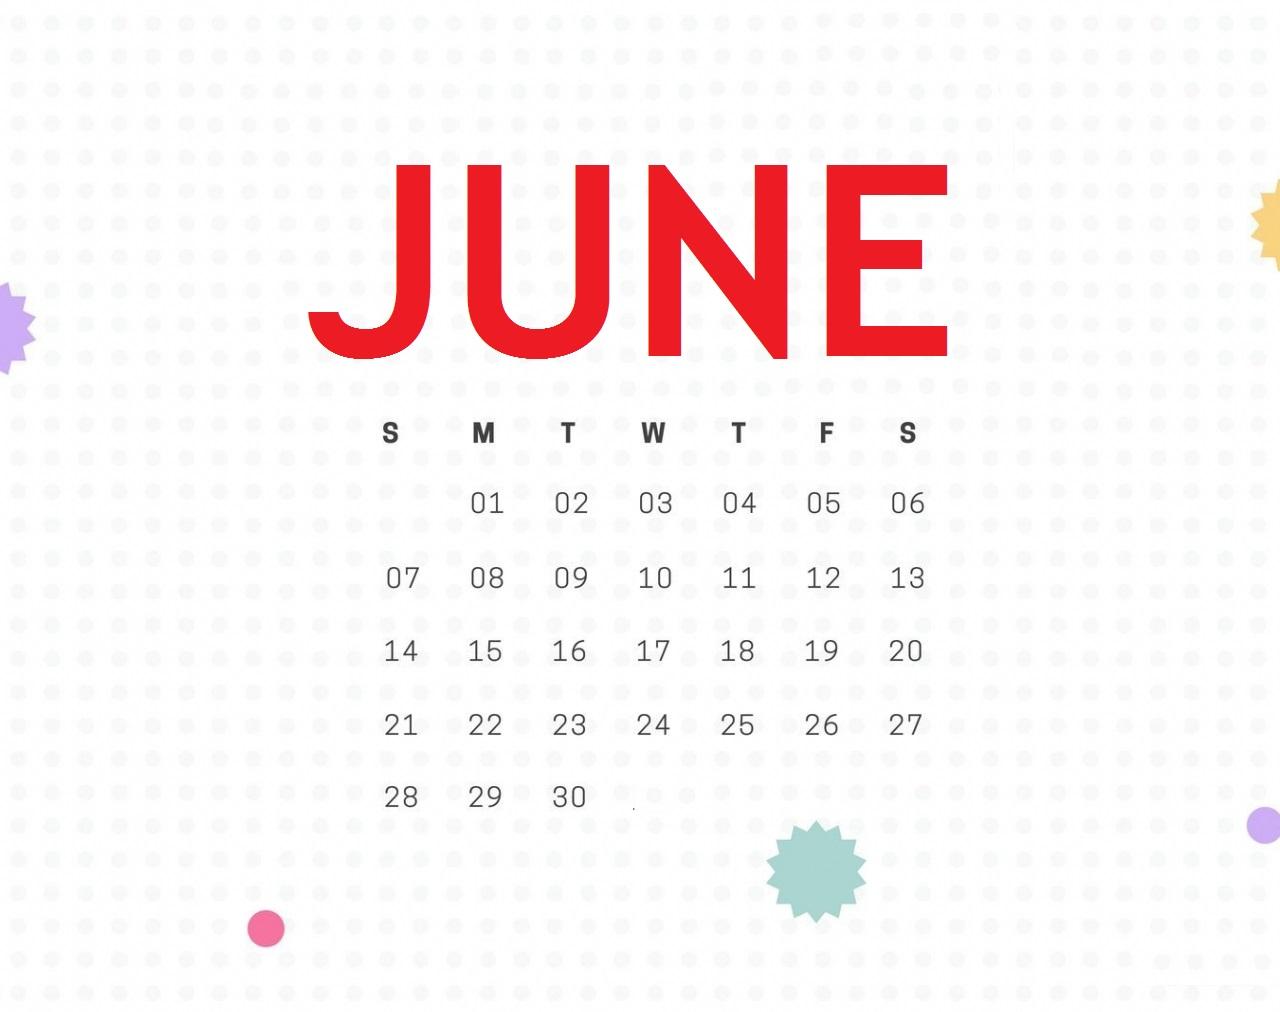 Cute June 2020 iPhone Wallpaper